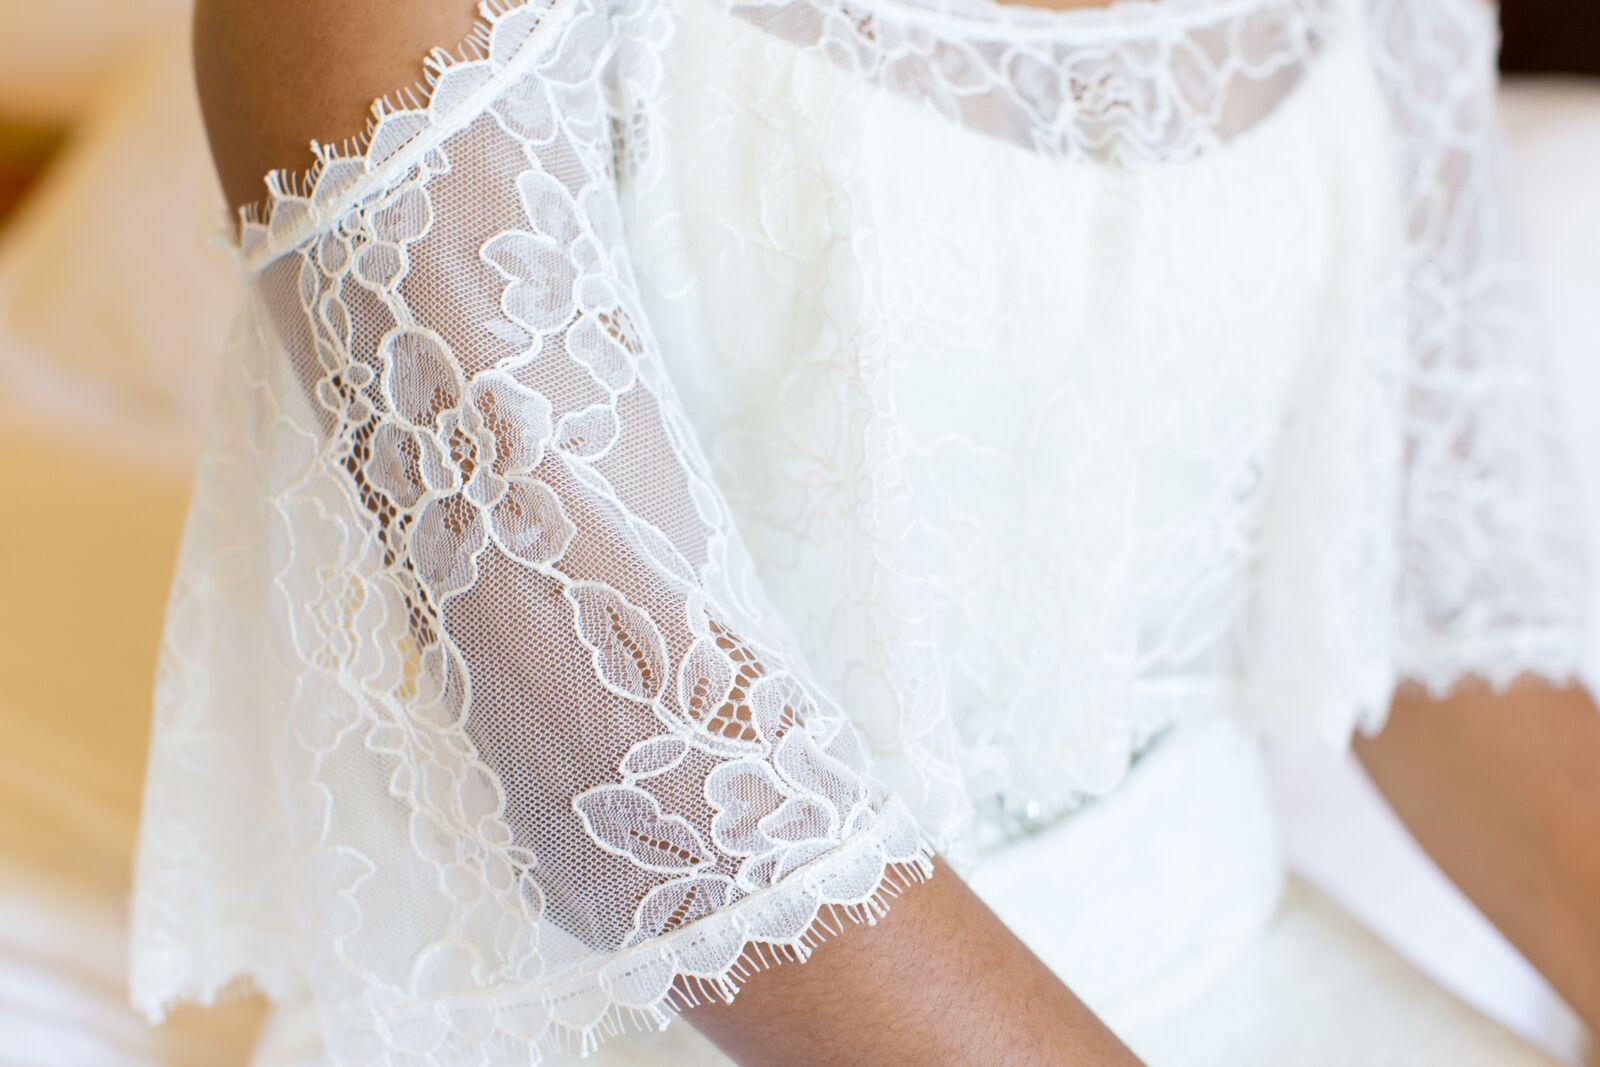 bohemian-lace-wedding-dress-1.jpg